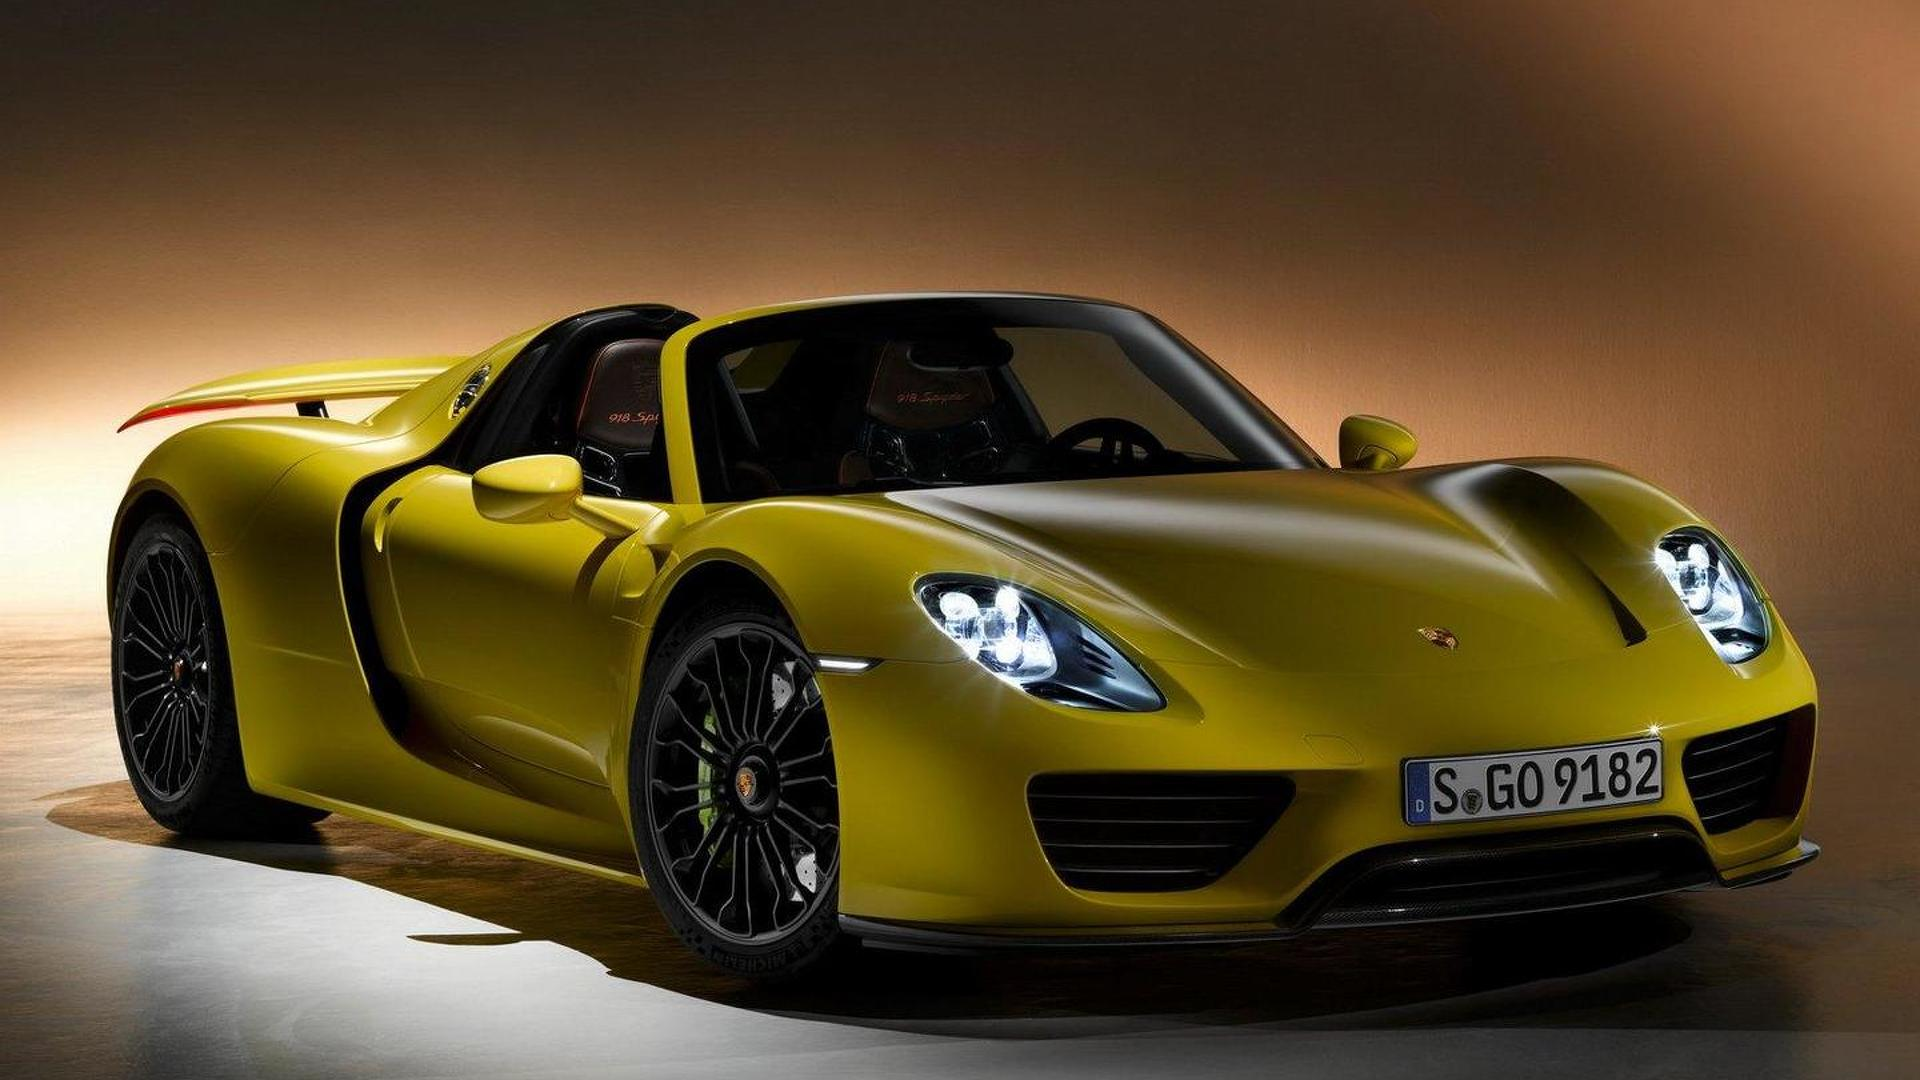 2013-433426-2014-porsche-918-spyder1 Amazing Porsche 918 Spyder sold Out Cars Trend